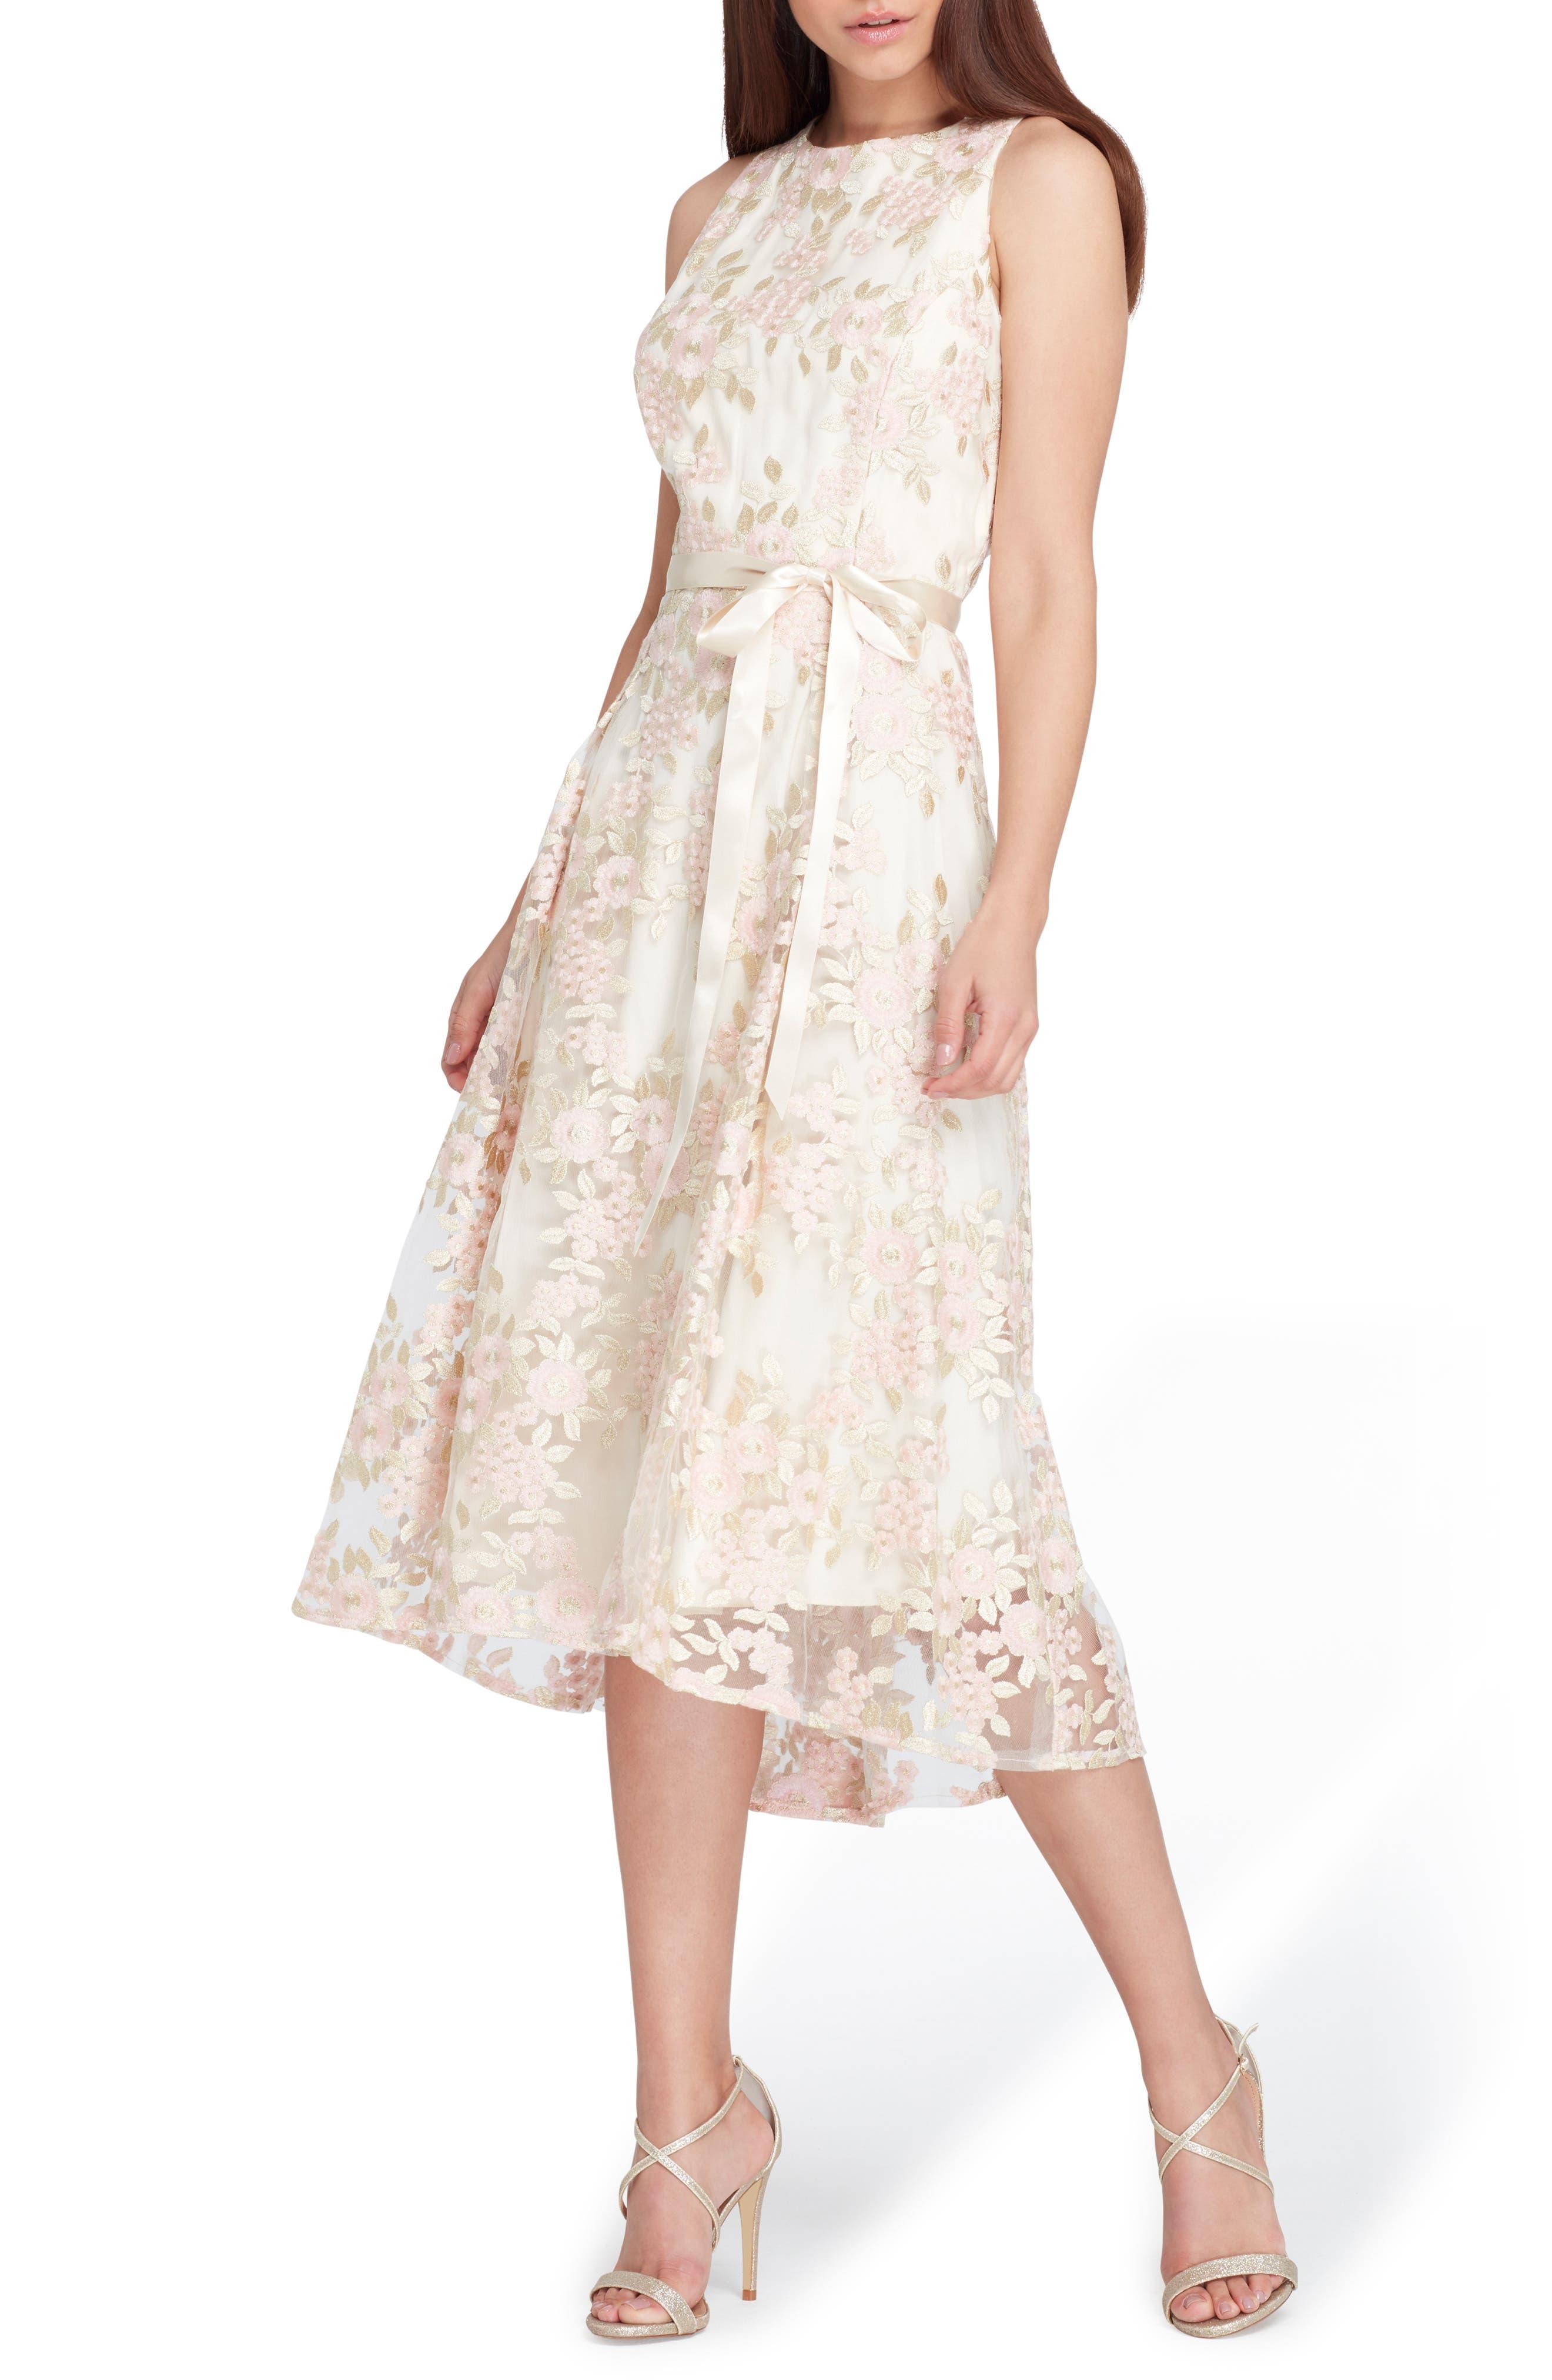 Tahari Floral Embroidered Dress, Metallic